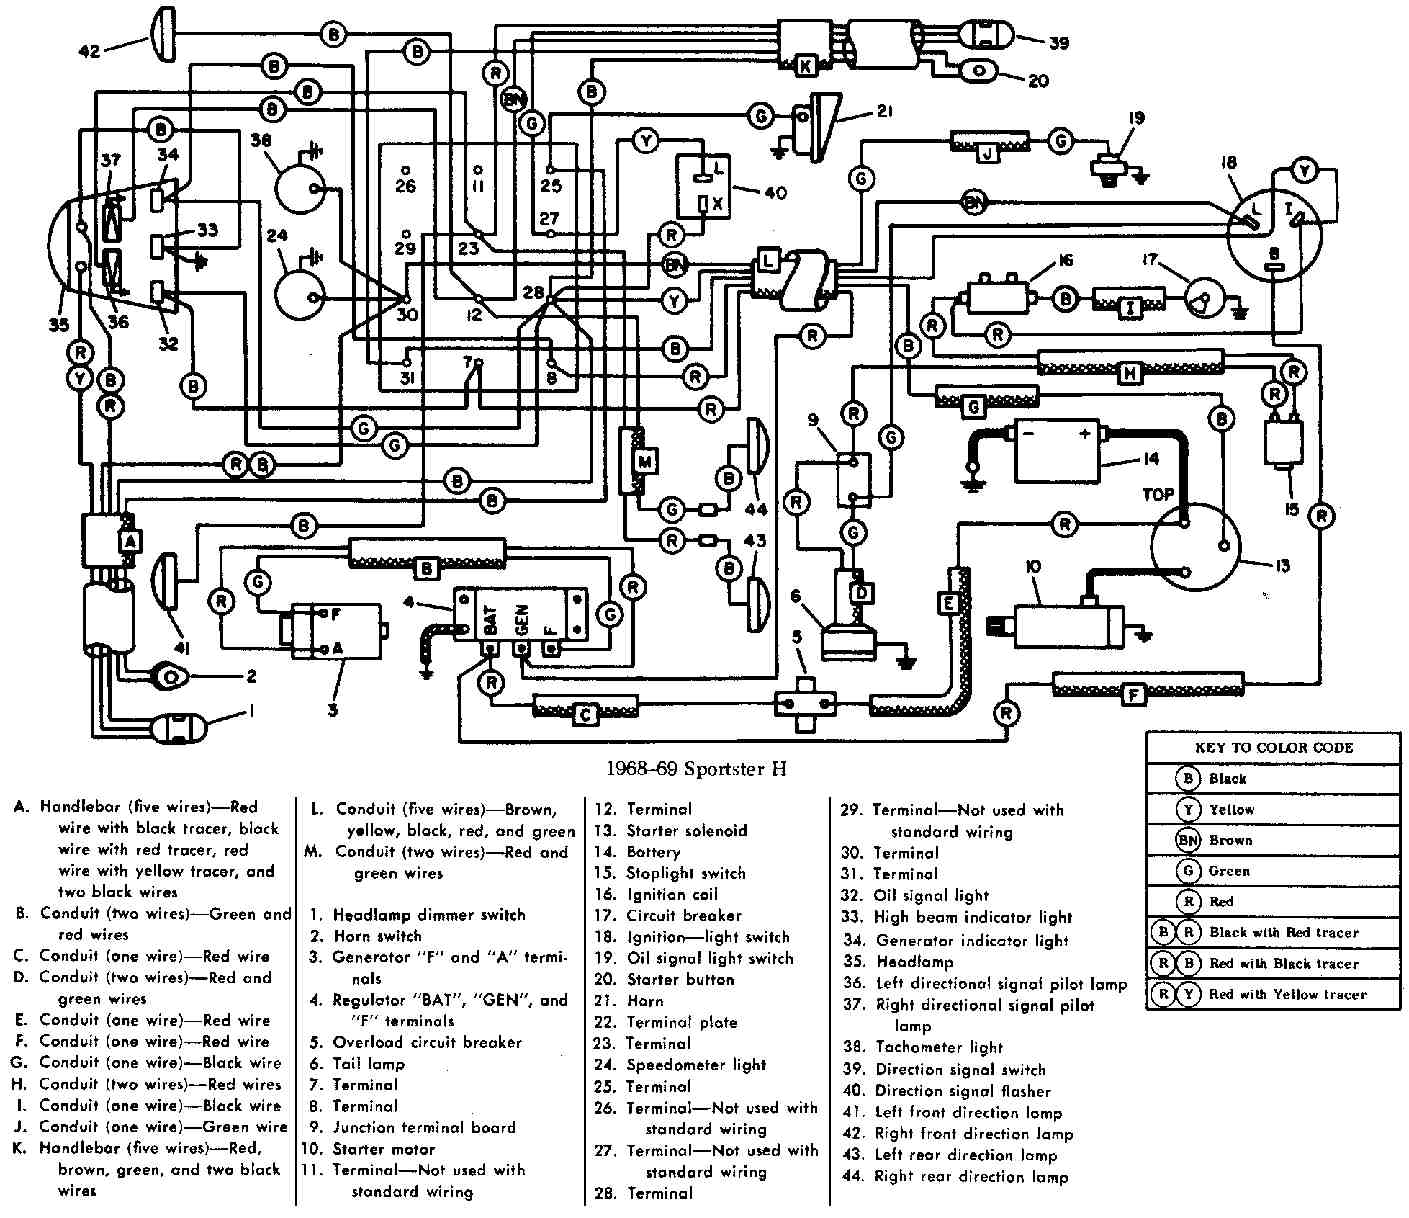 1999 harley flstc wiring diagram 1999 road king wiring